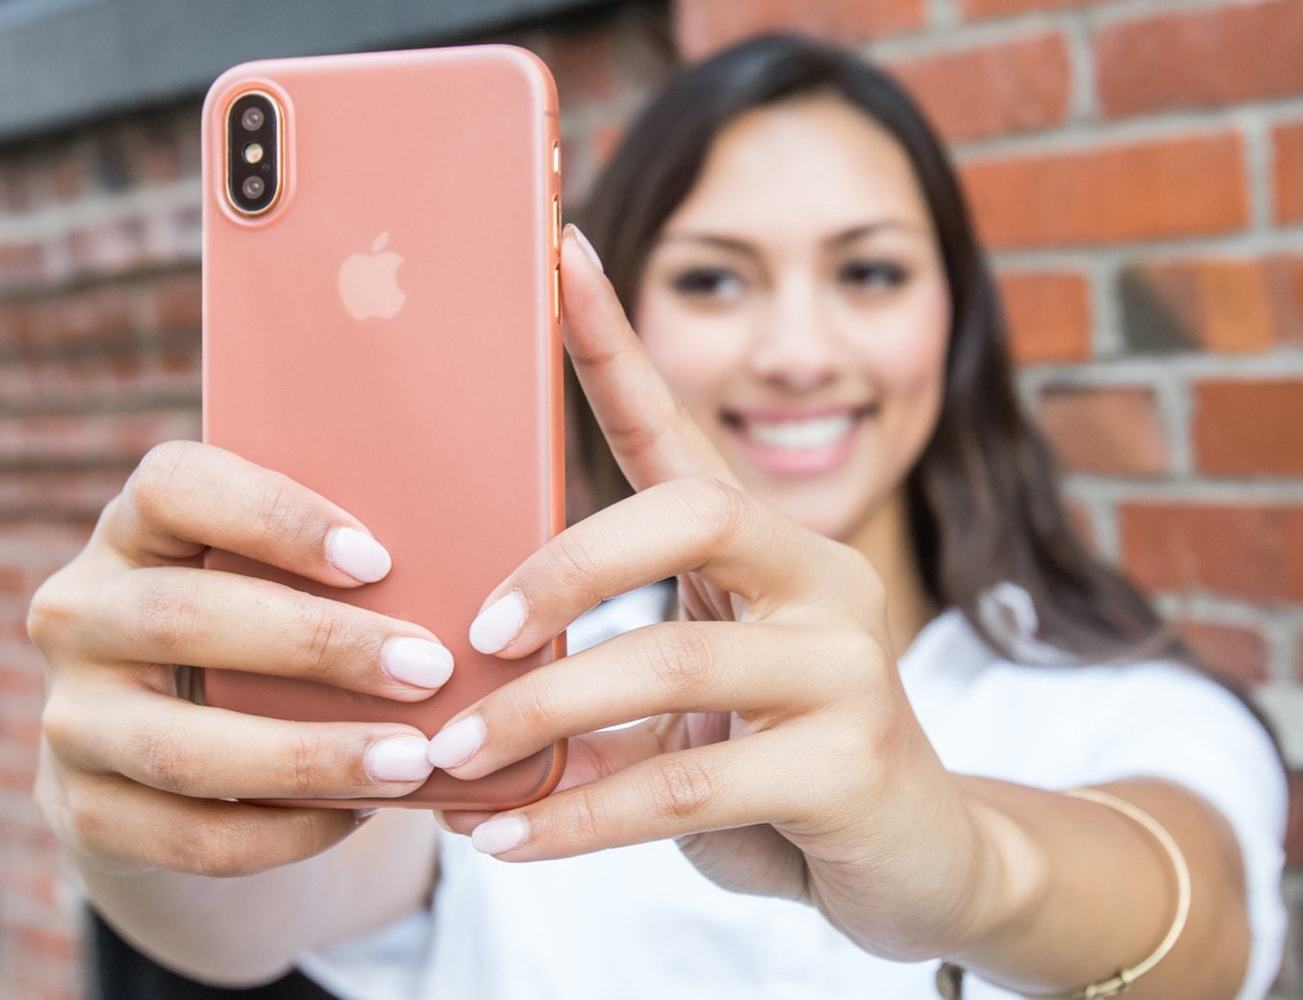 Peel Super Thin iPhone X Case